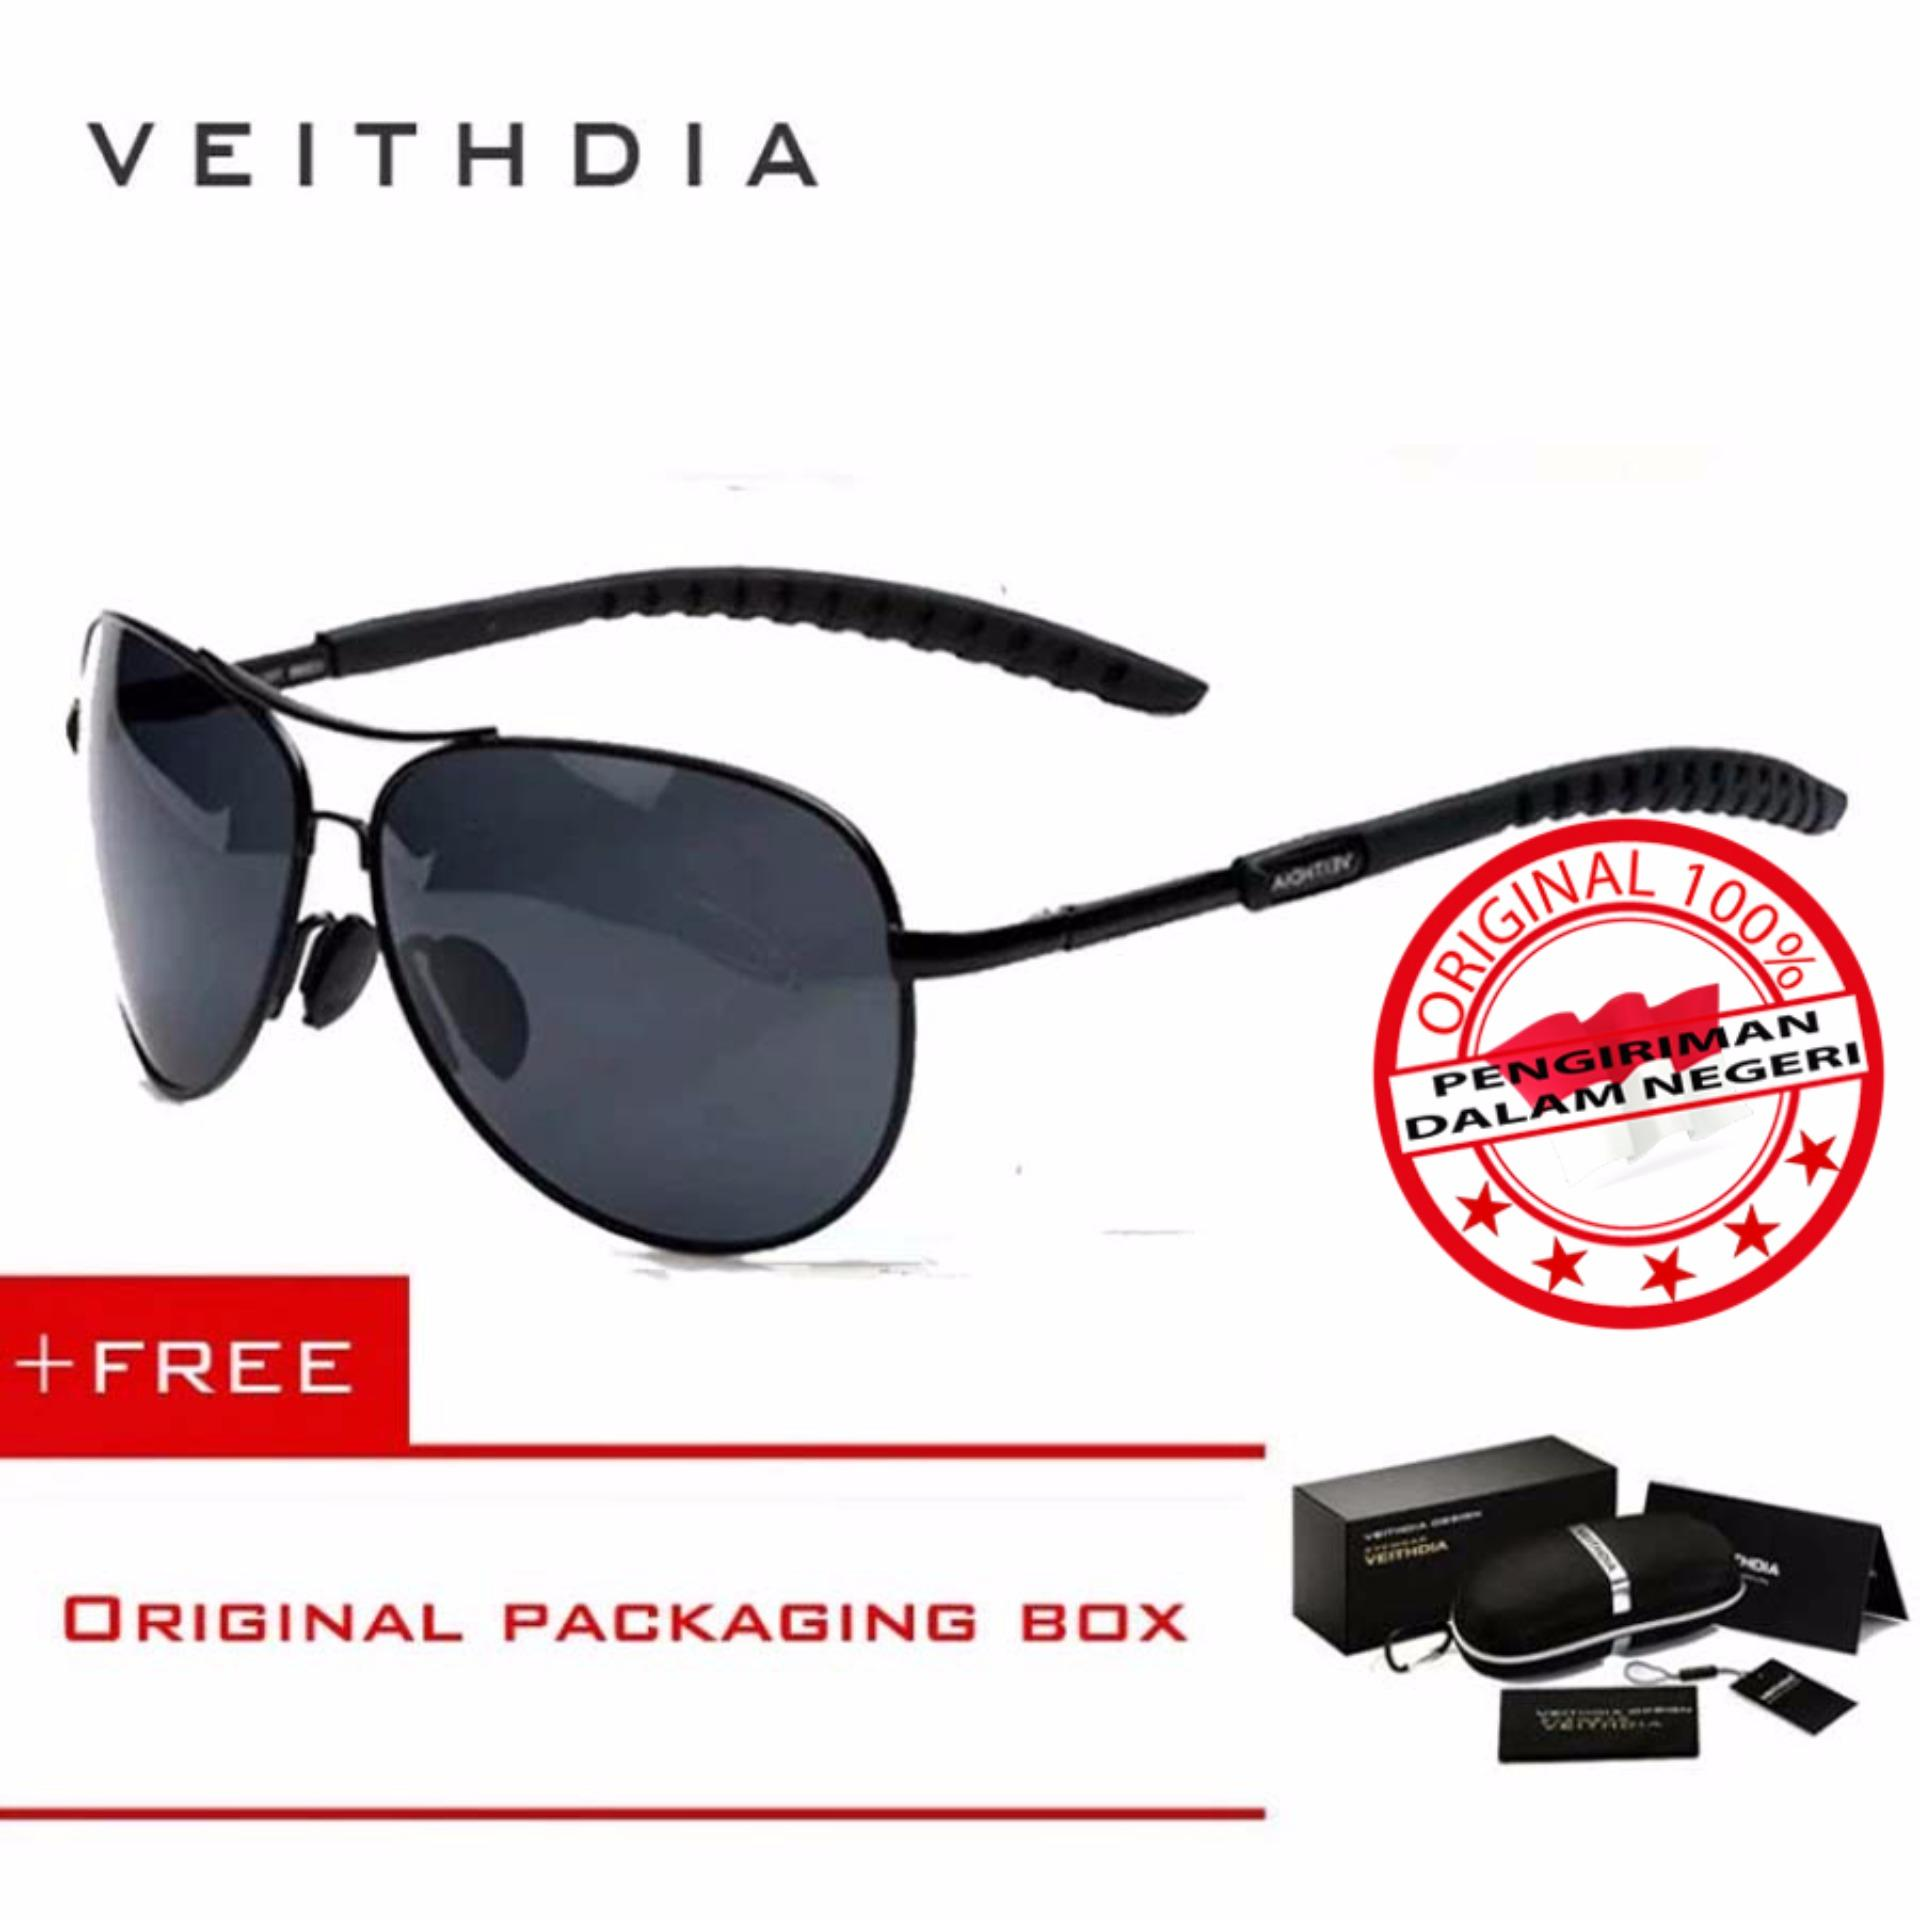 Jual Beli Veithdia Kacamata Pria Hitam Aluminium Sport Dan Travel Elegant Mirrored Uv400 Polarized Sunglasses 3088 Free Kotak Hardcase